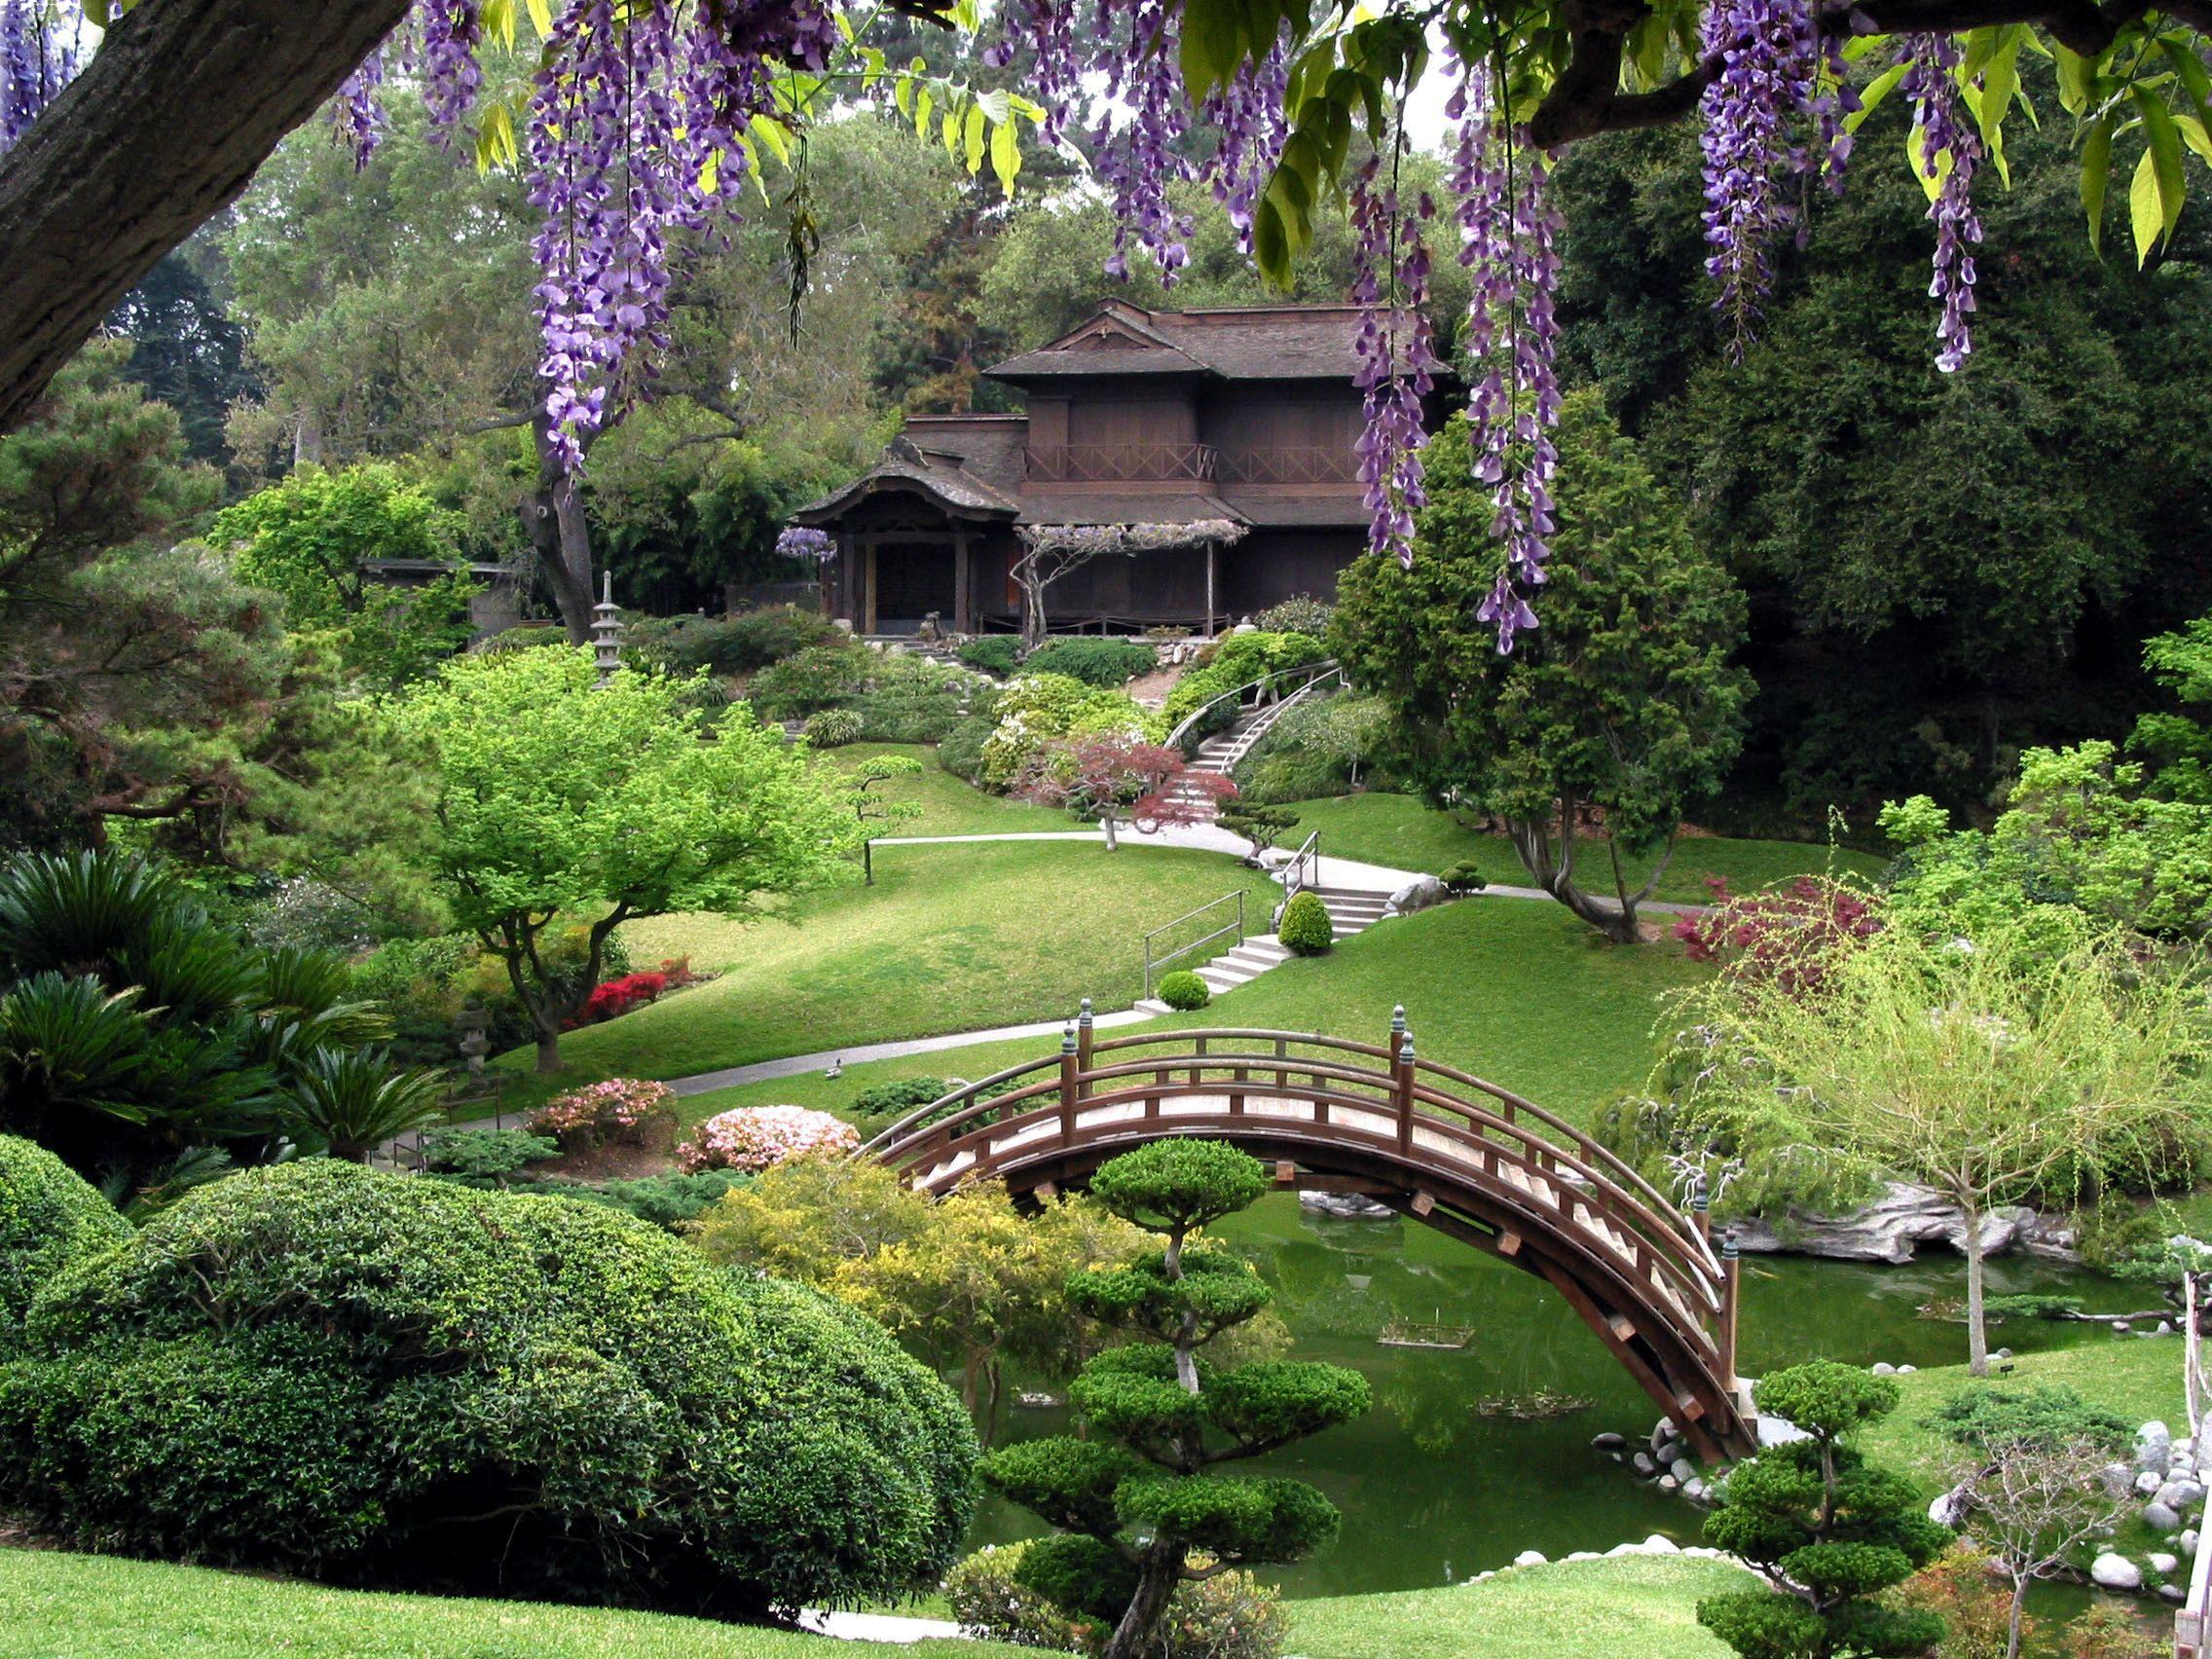 323a94dc6238cd54b44f1bf10bd7b5d5 - Botanical Gardens Los Angeles Huntington Library